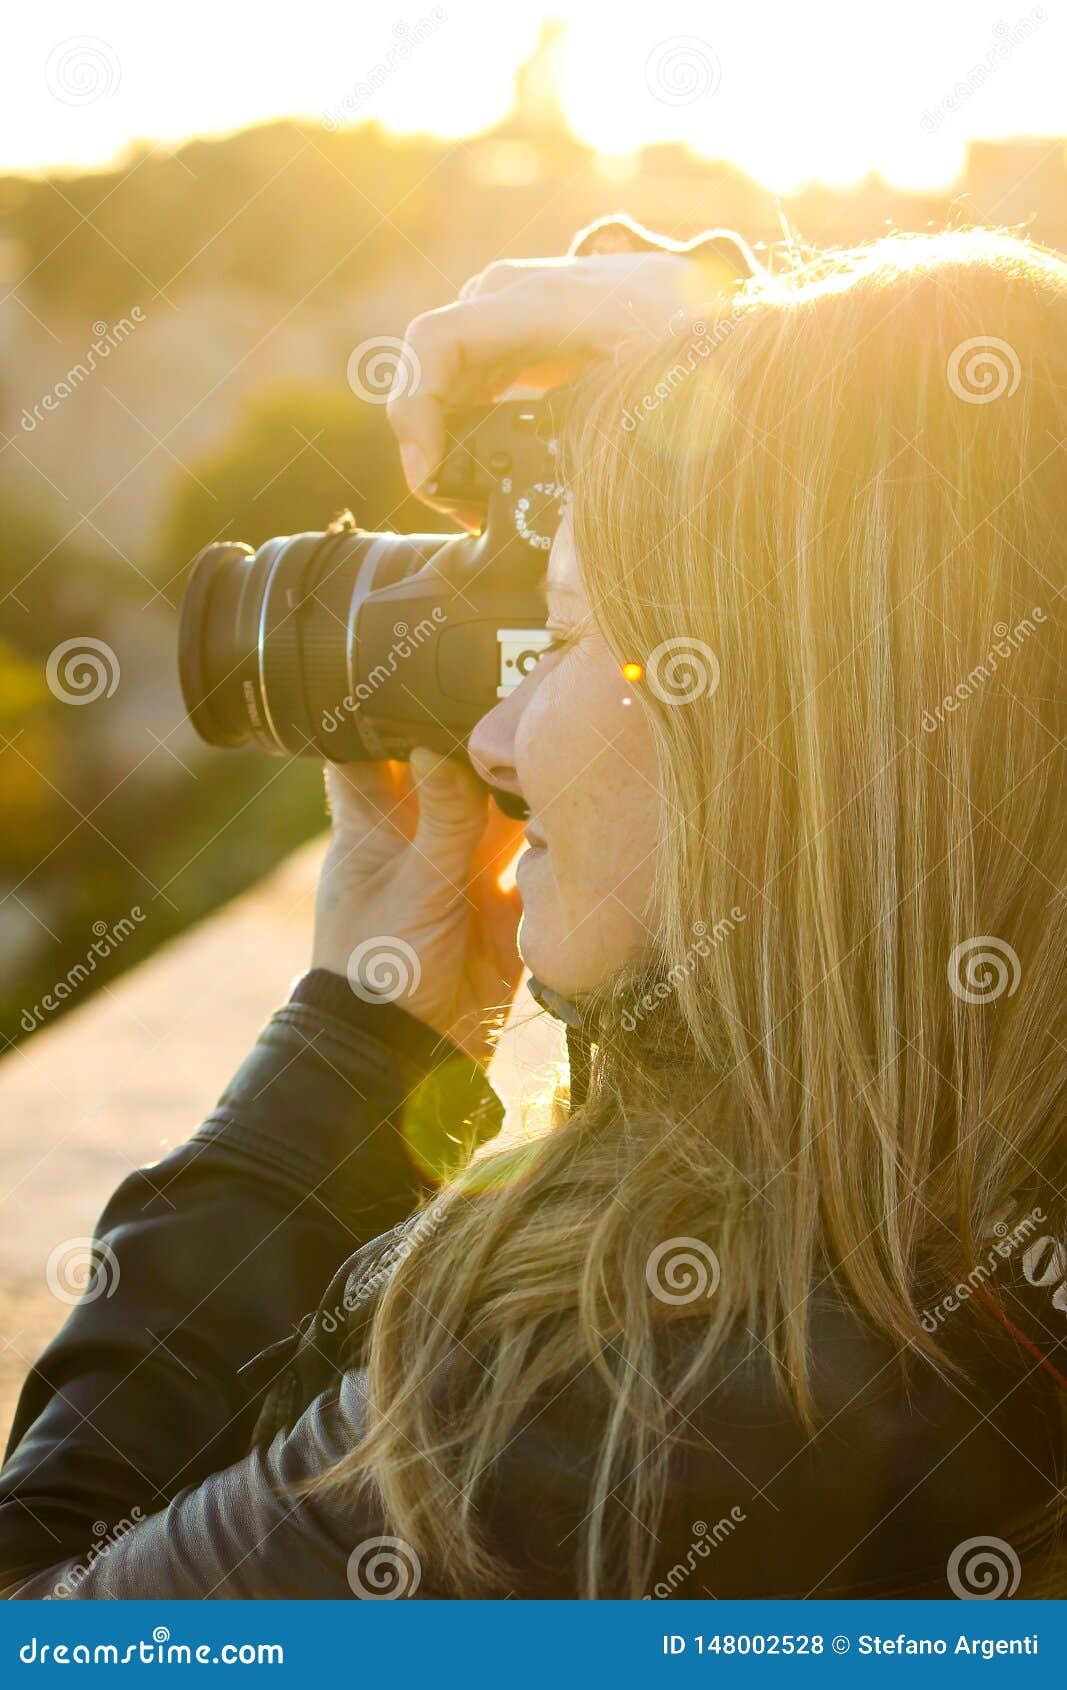 Blonde girl takes photos with reflex